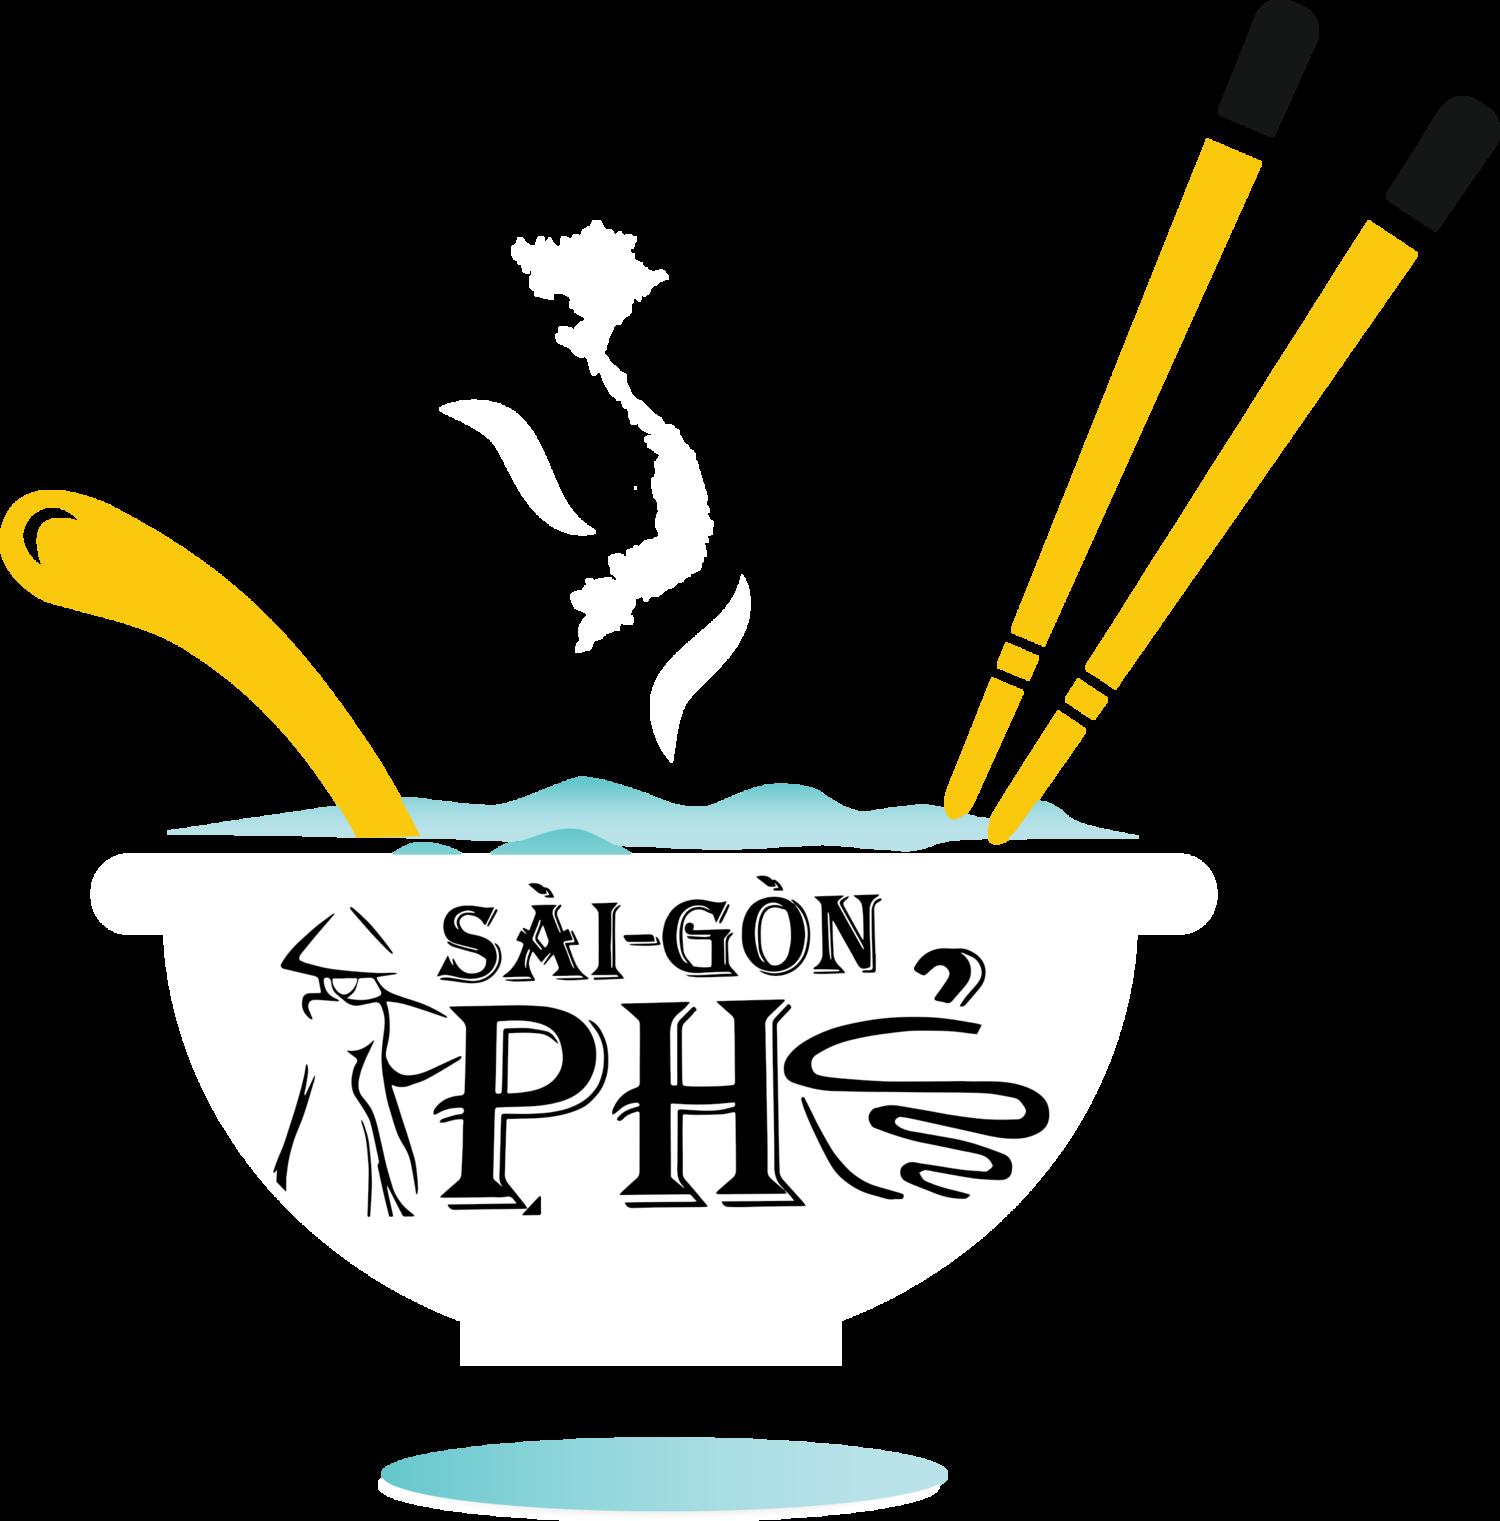 Noodles clipart pho vietnamese. Saigon